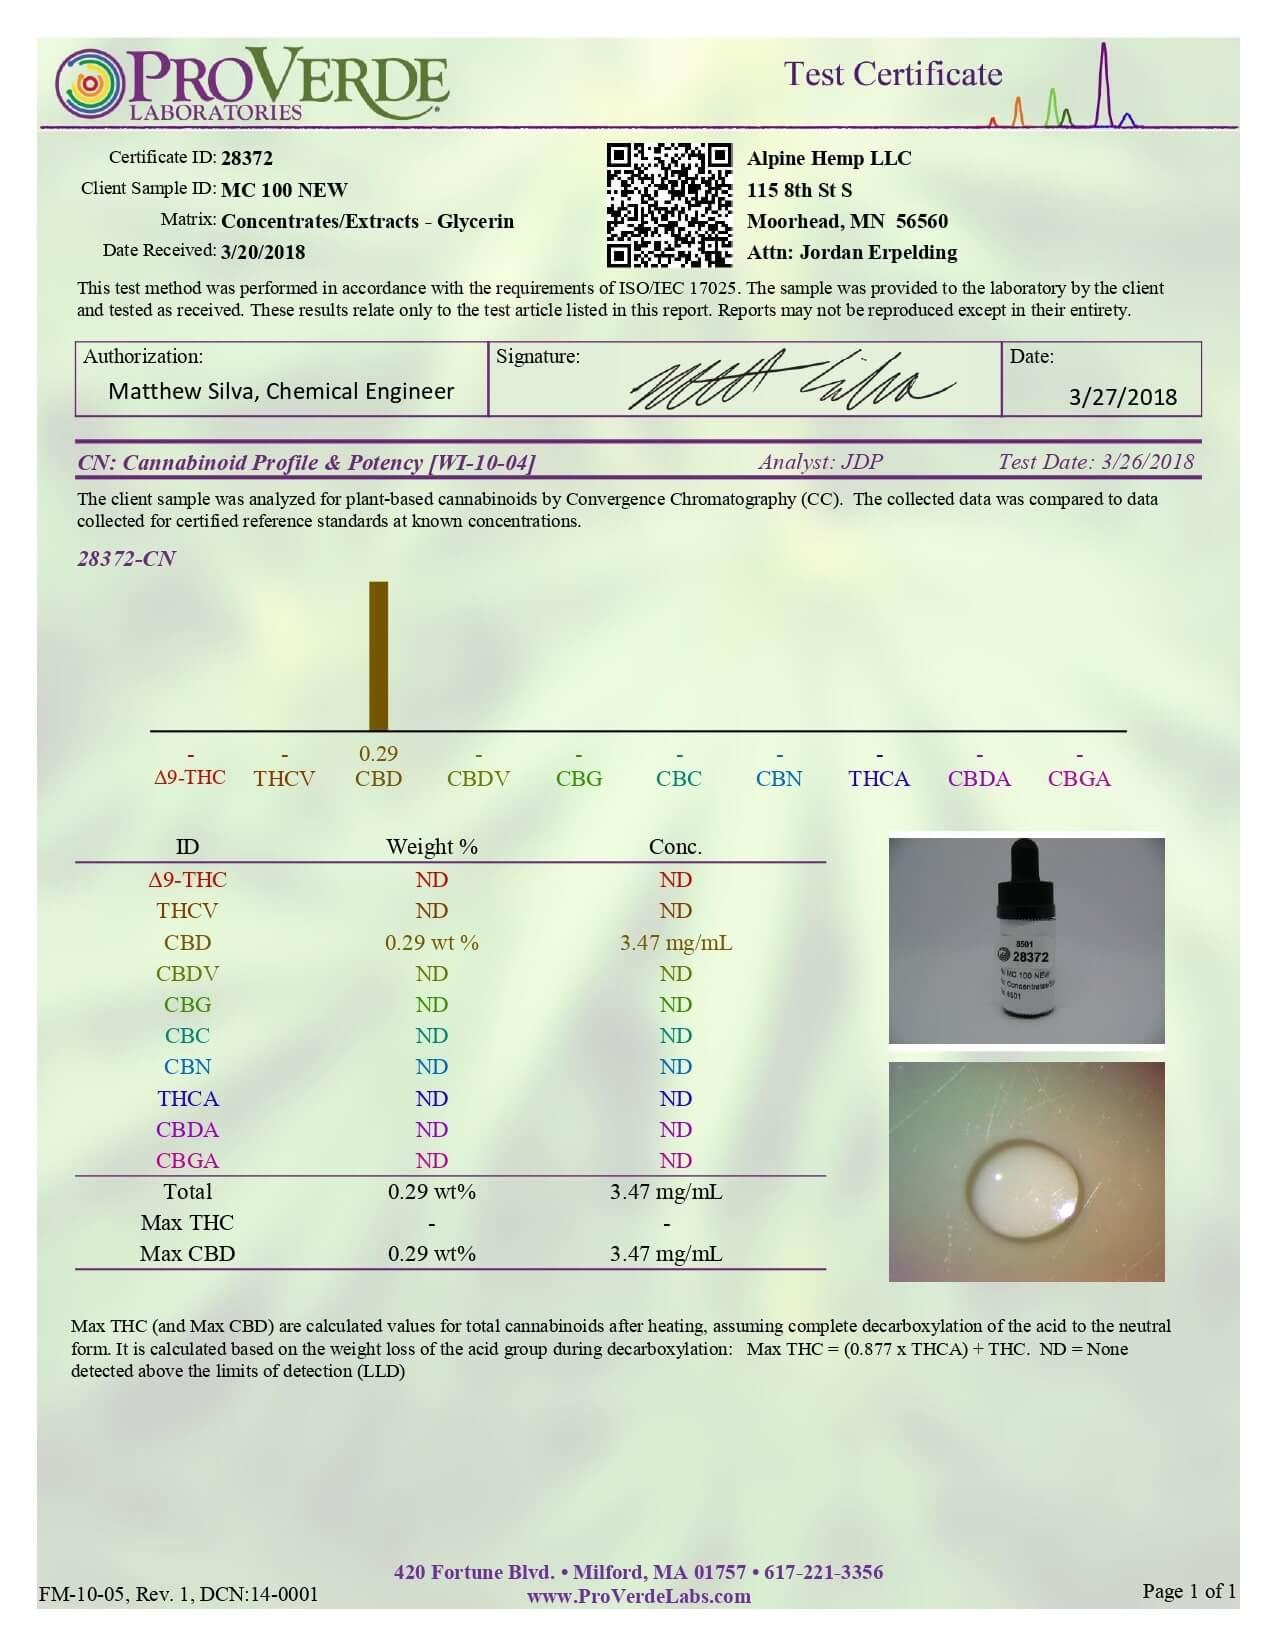 Alpine Hemp CBD Vape Mint Chocolate Swirl Lab Report 100mg